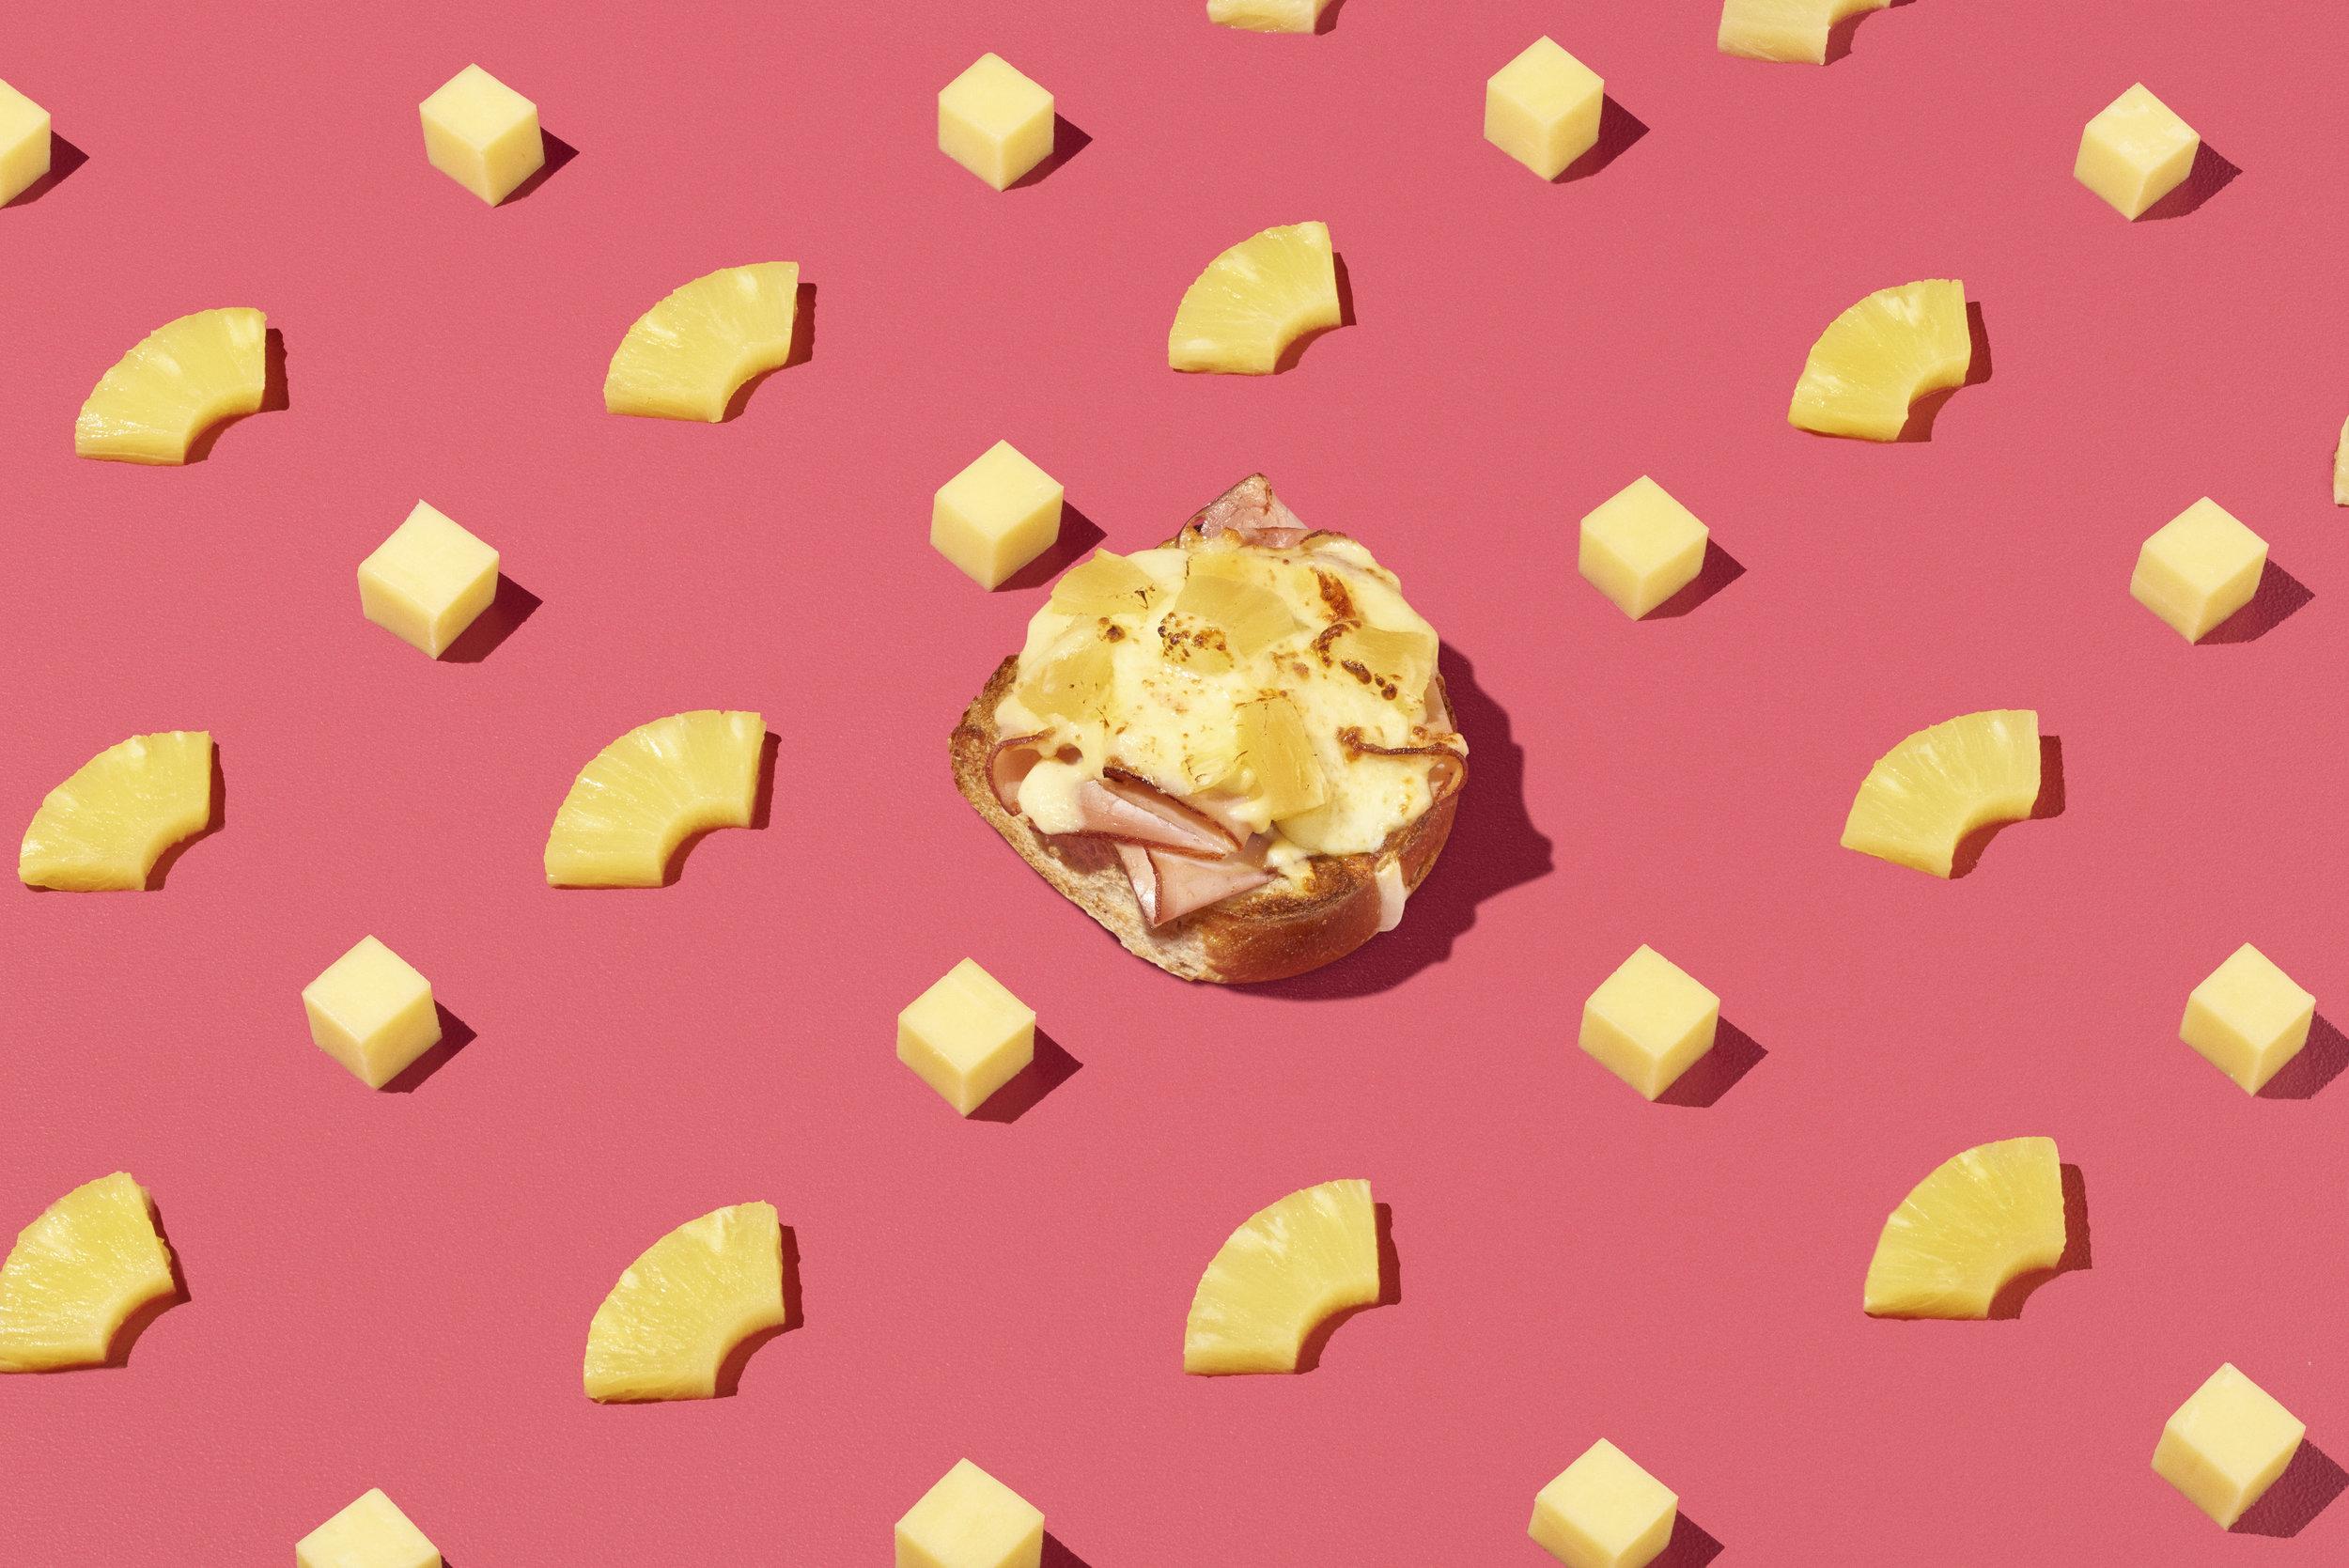 20160215_WLW0919_LightRaspberry_Cheese-Ham-Pineapple_383.jpg